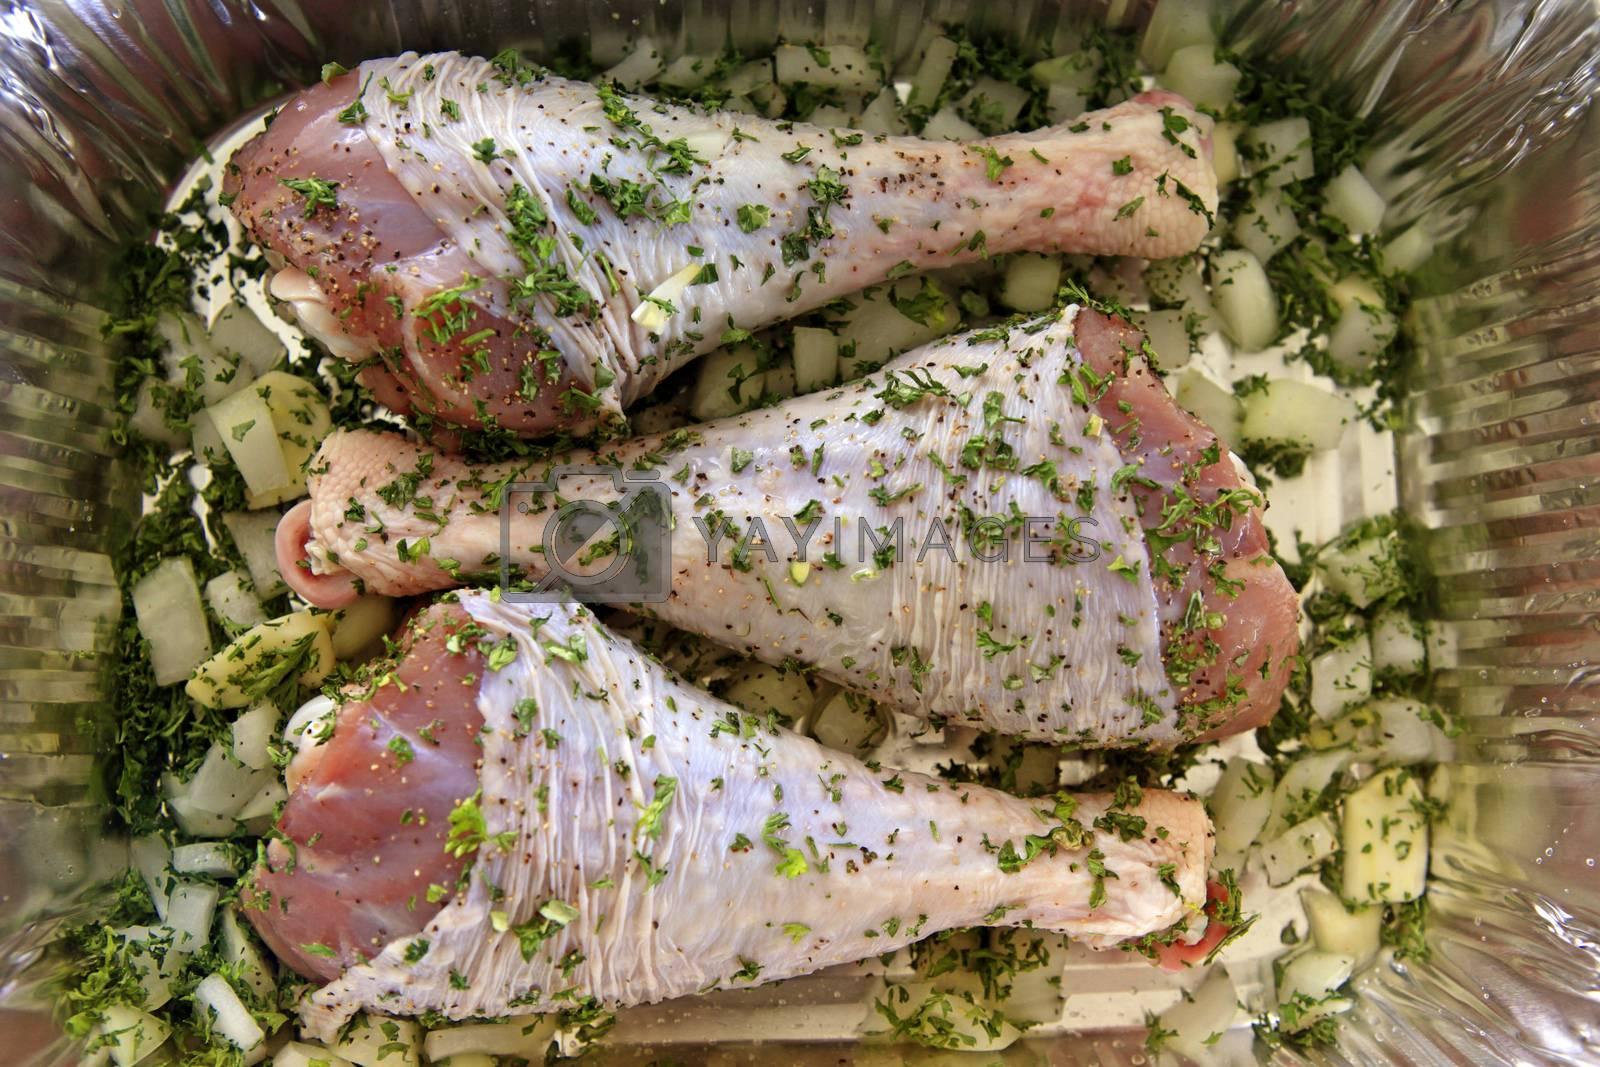 Turkey leg on steel board with herbs